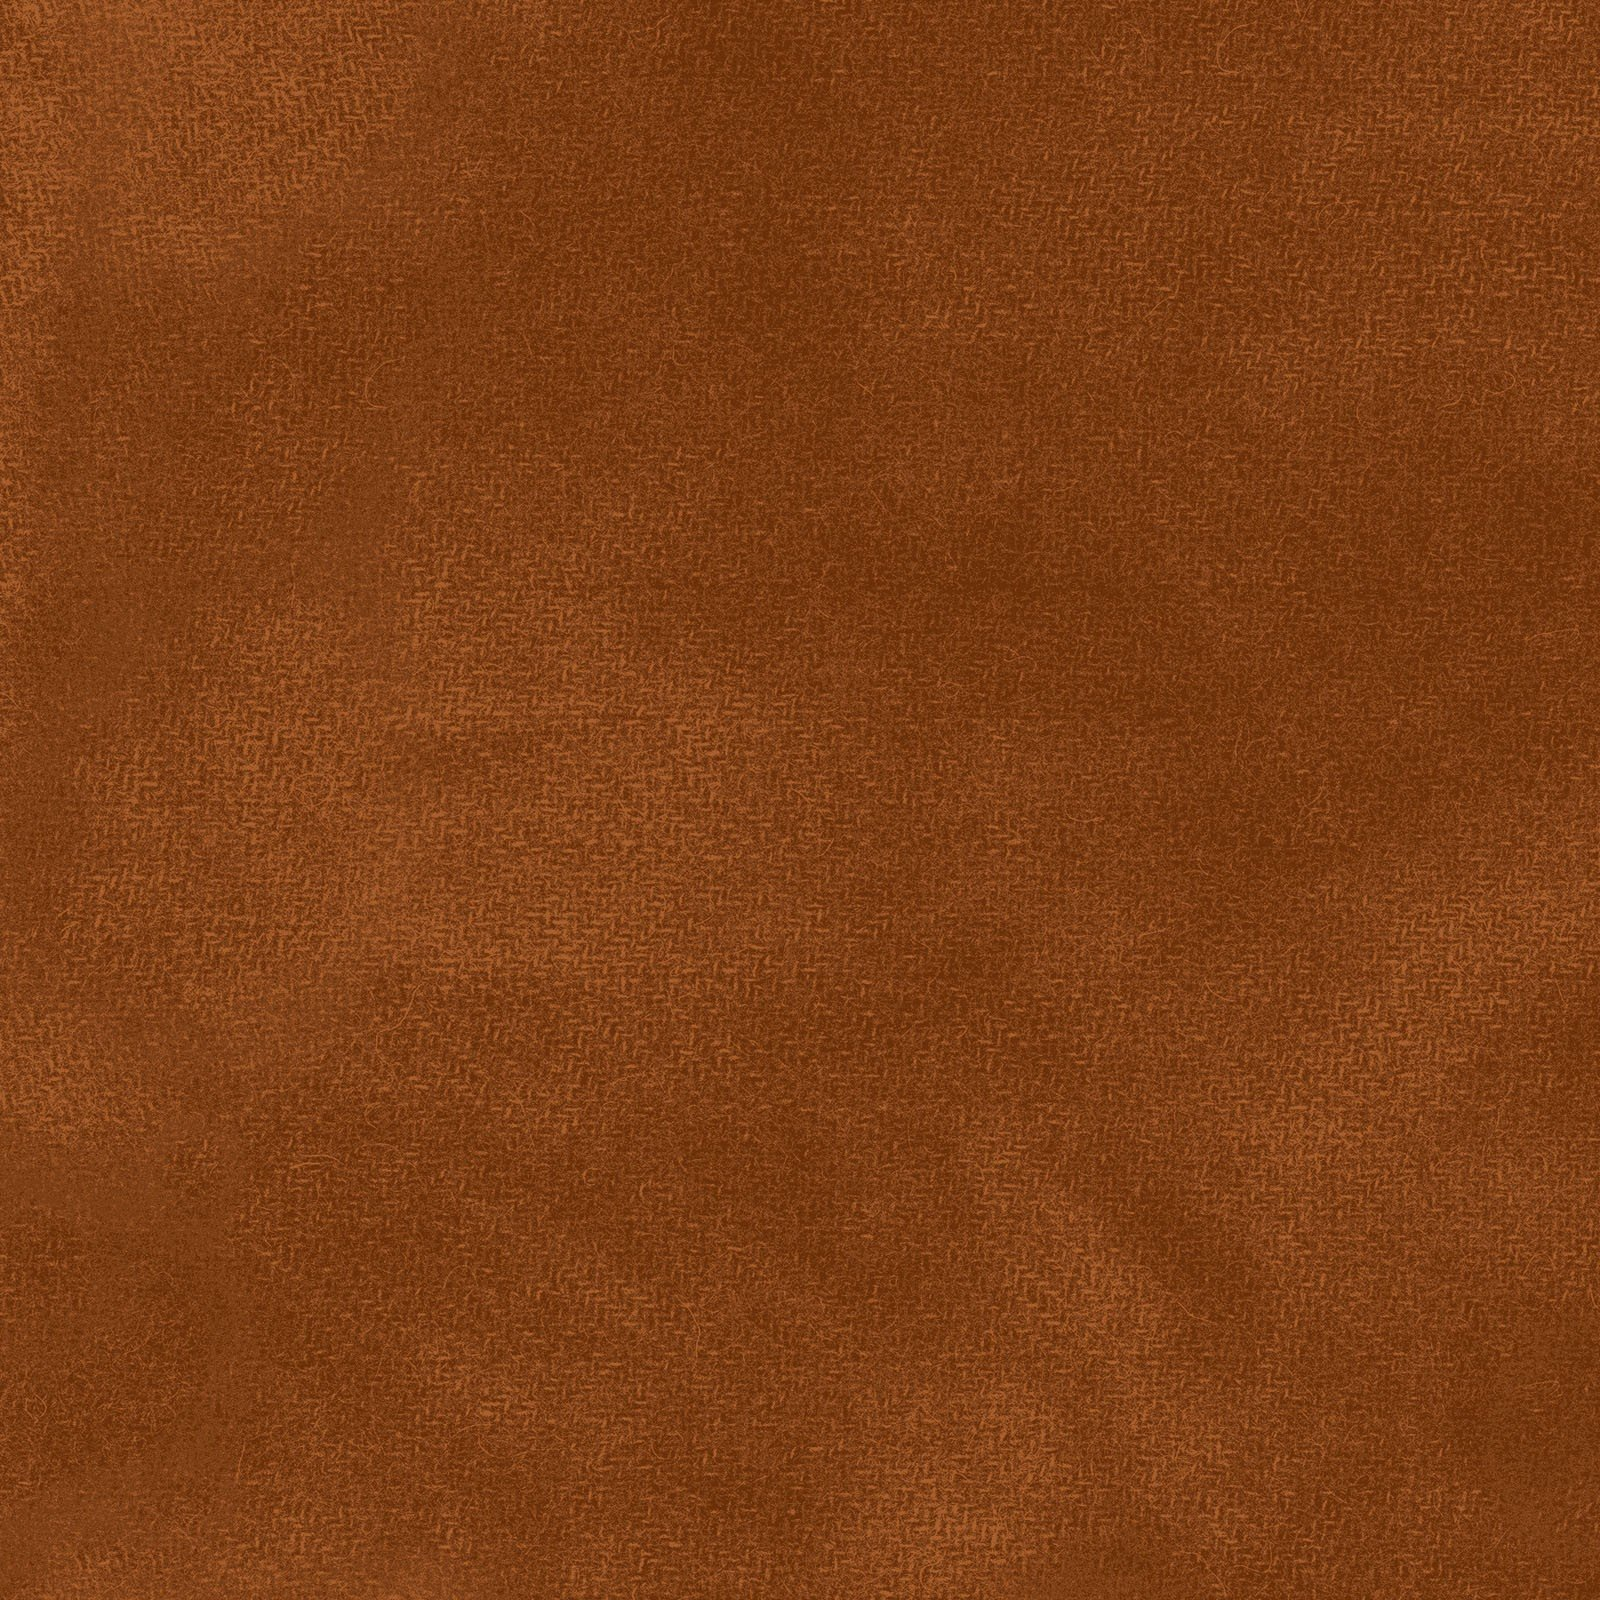 Woolies Flannel - Cedarwood<br/>Maywood Studio F9200-O